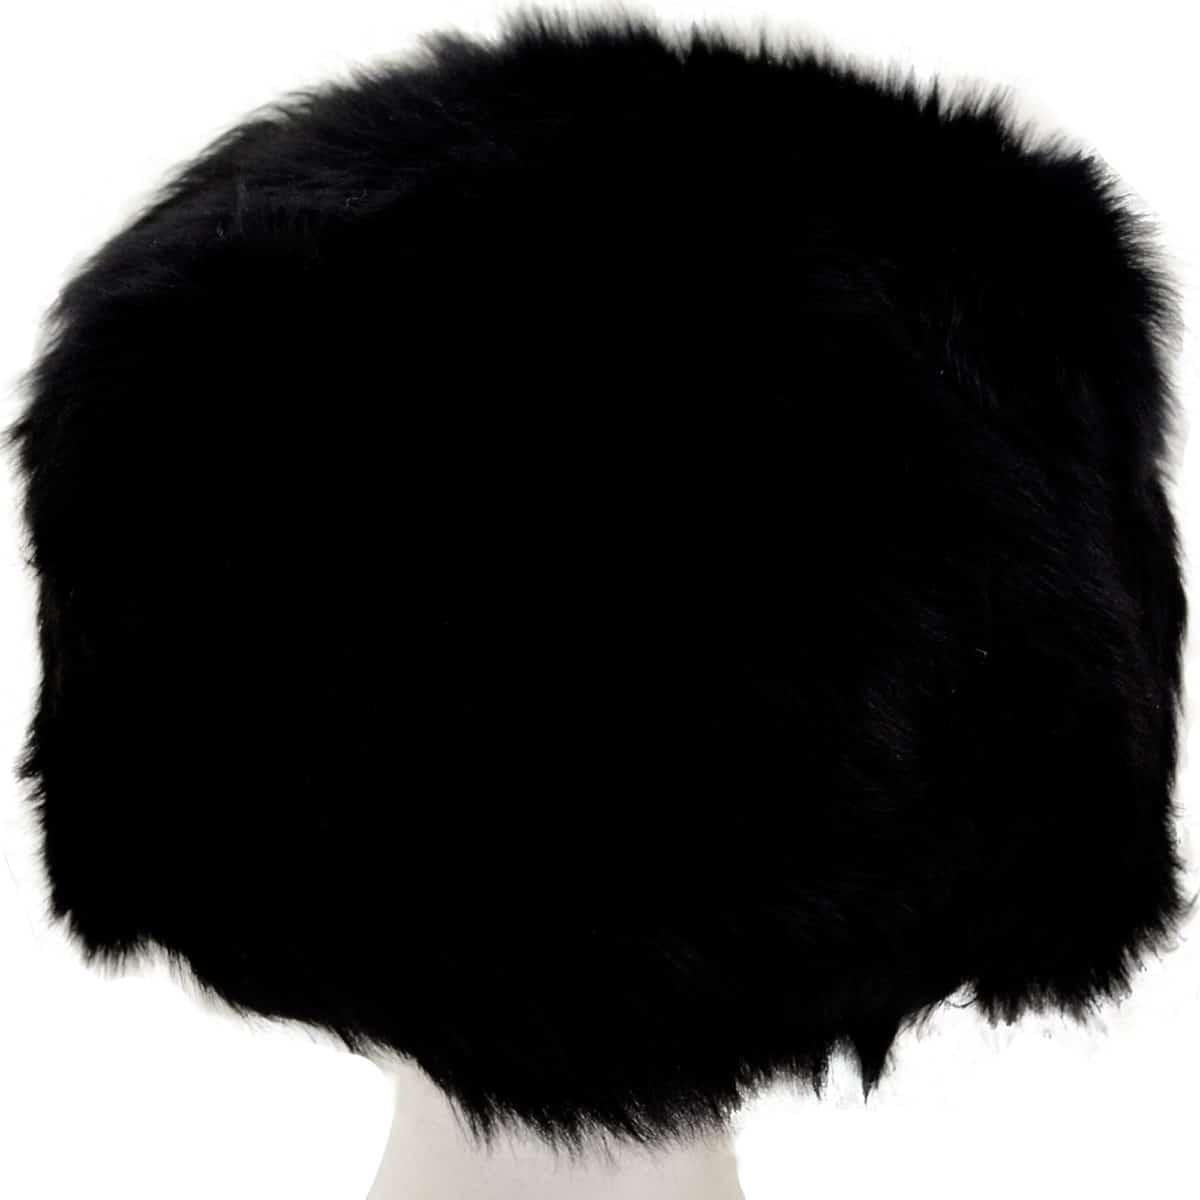 Fern - Ladies Full Sheepskin Hat - Black (Top)